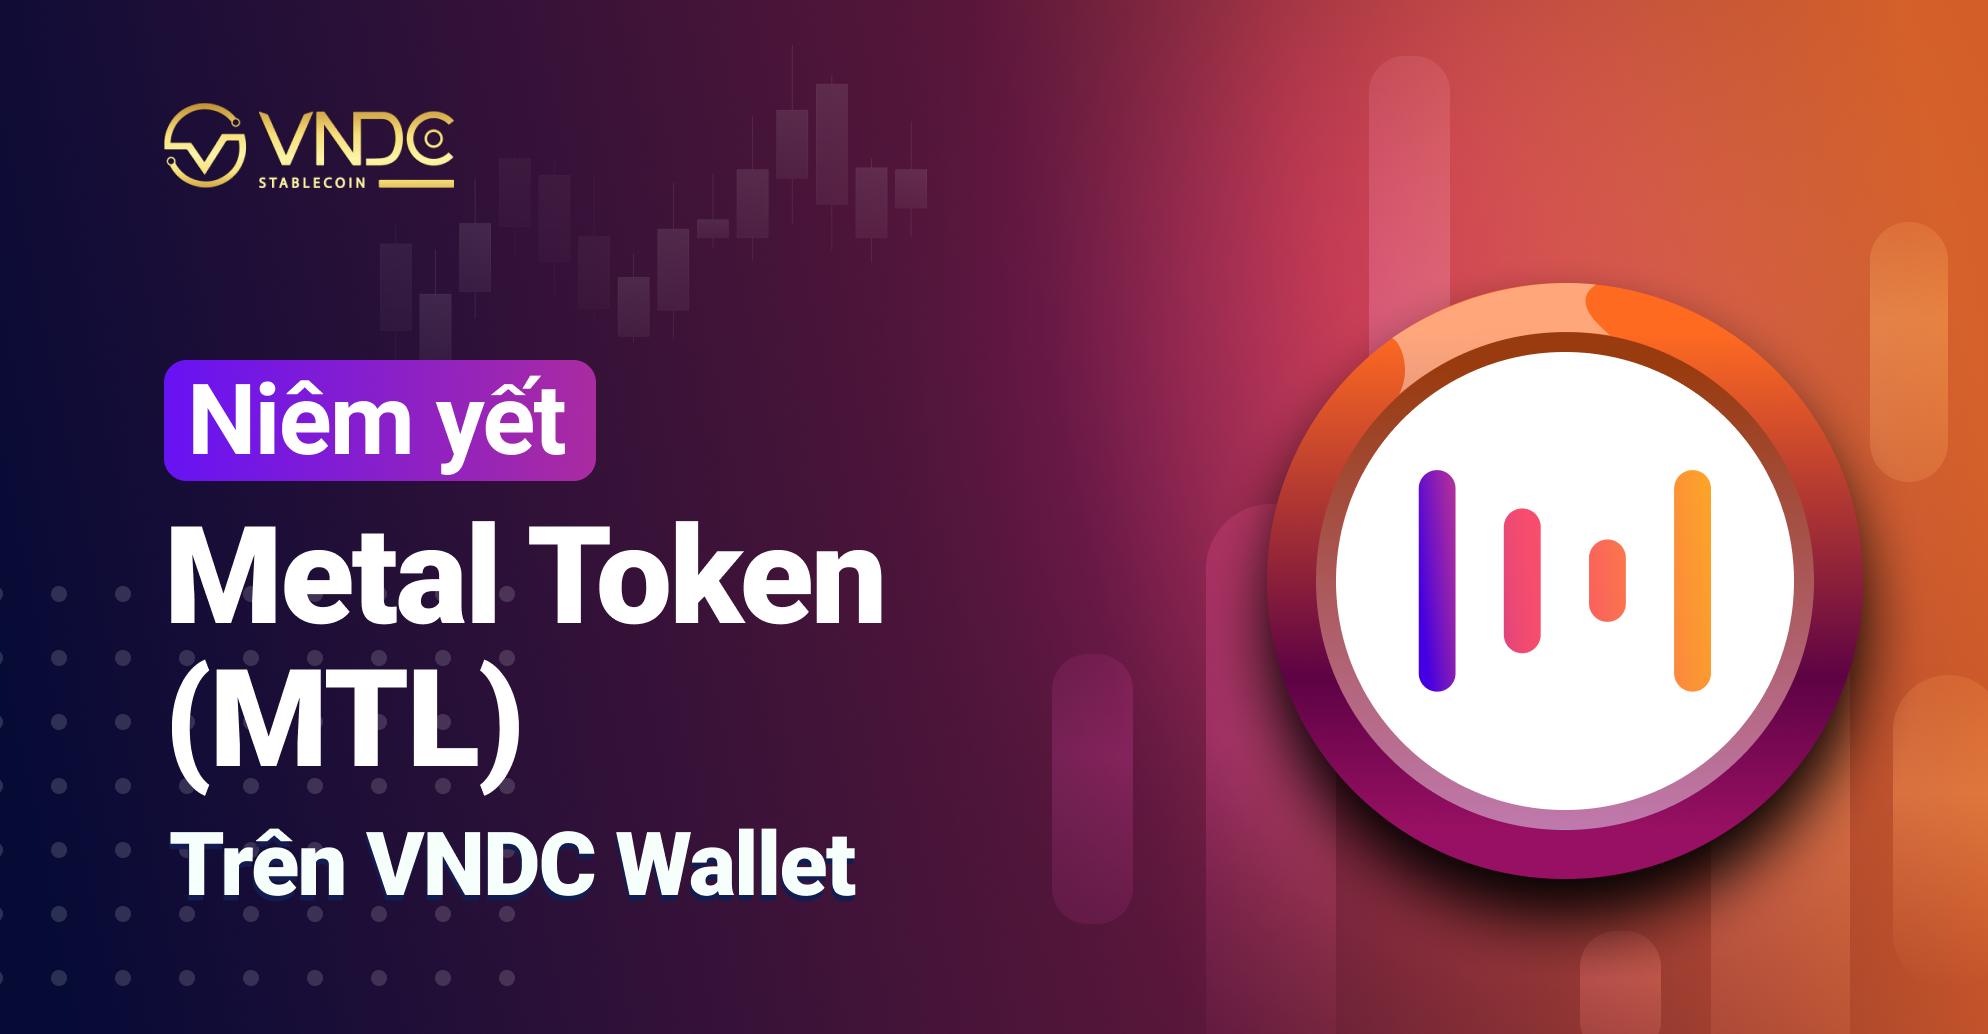 Niêm yết Metal Token (MTL) trên VNDC Wallet